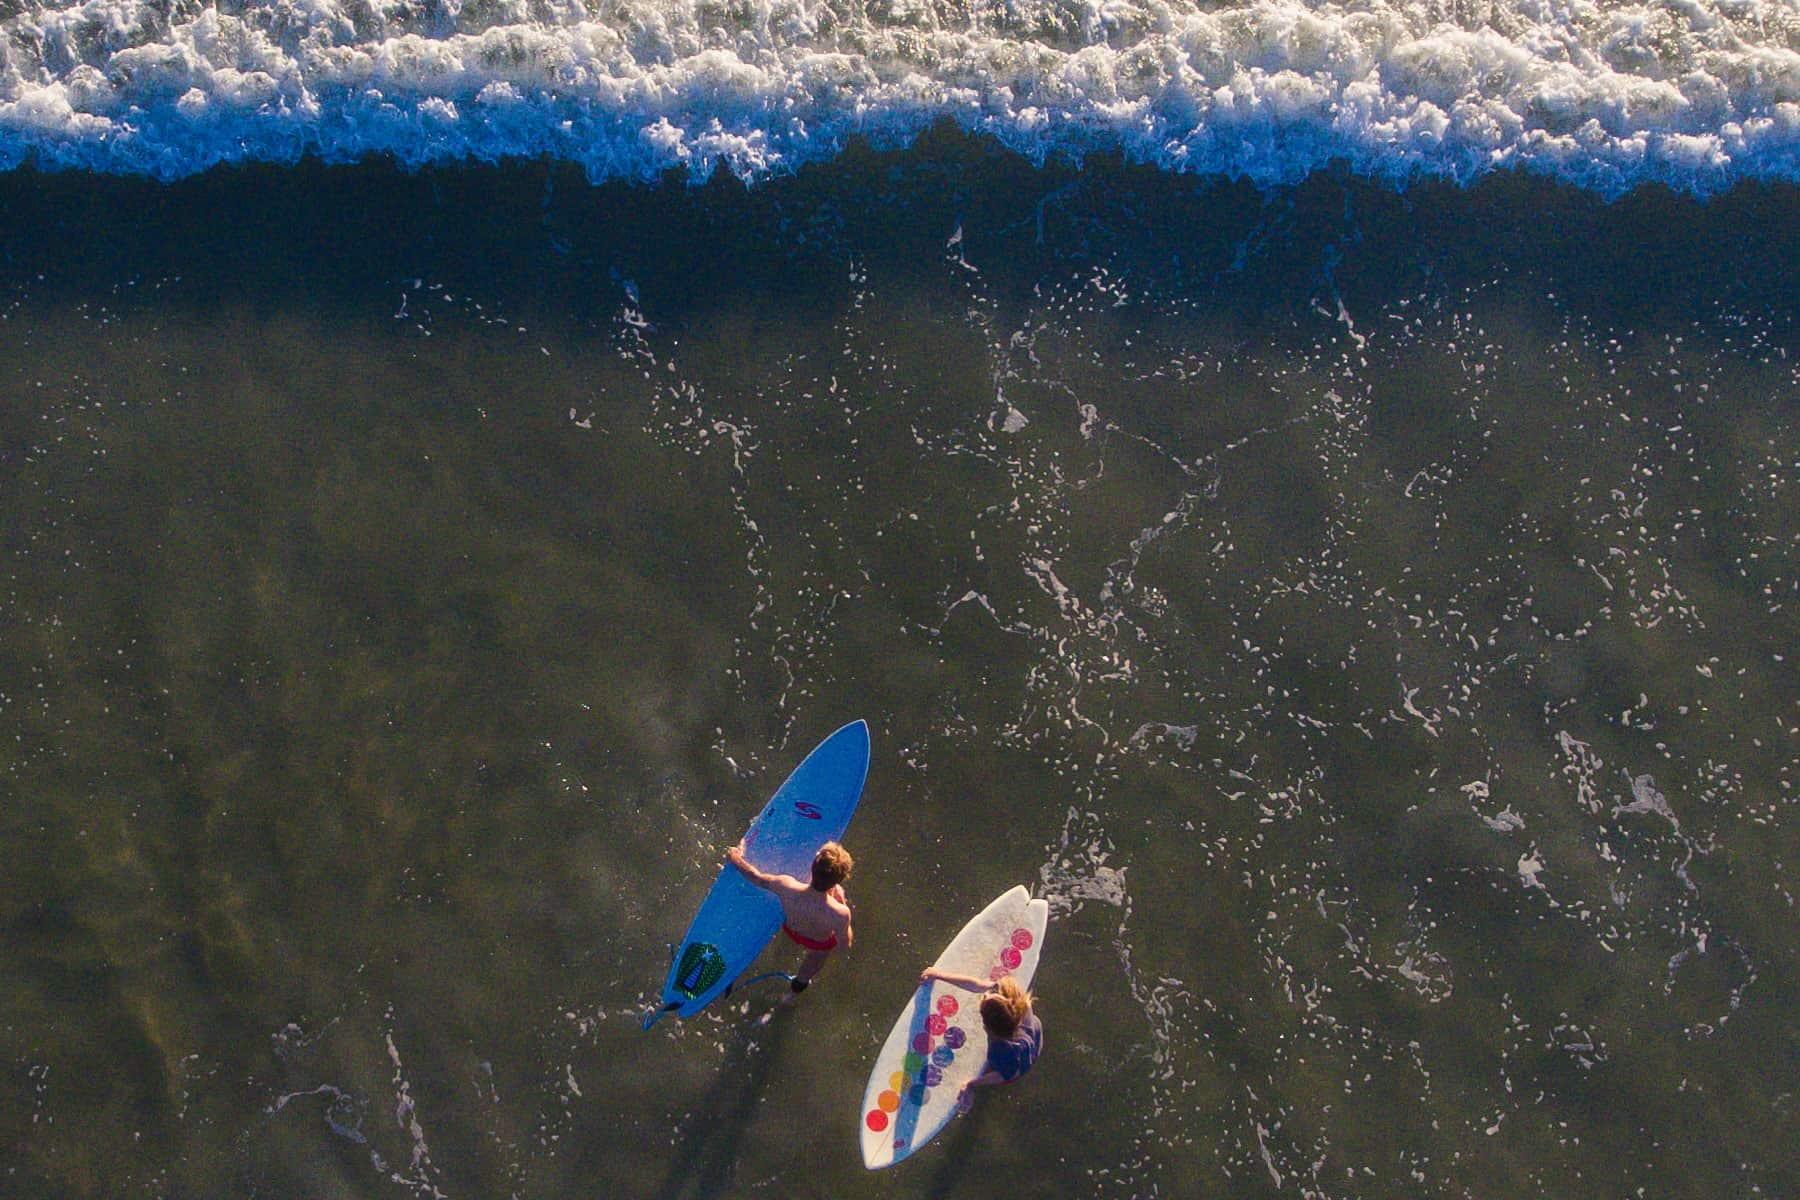 resor_bulgarien_surf_nygren_lind